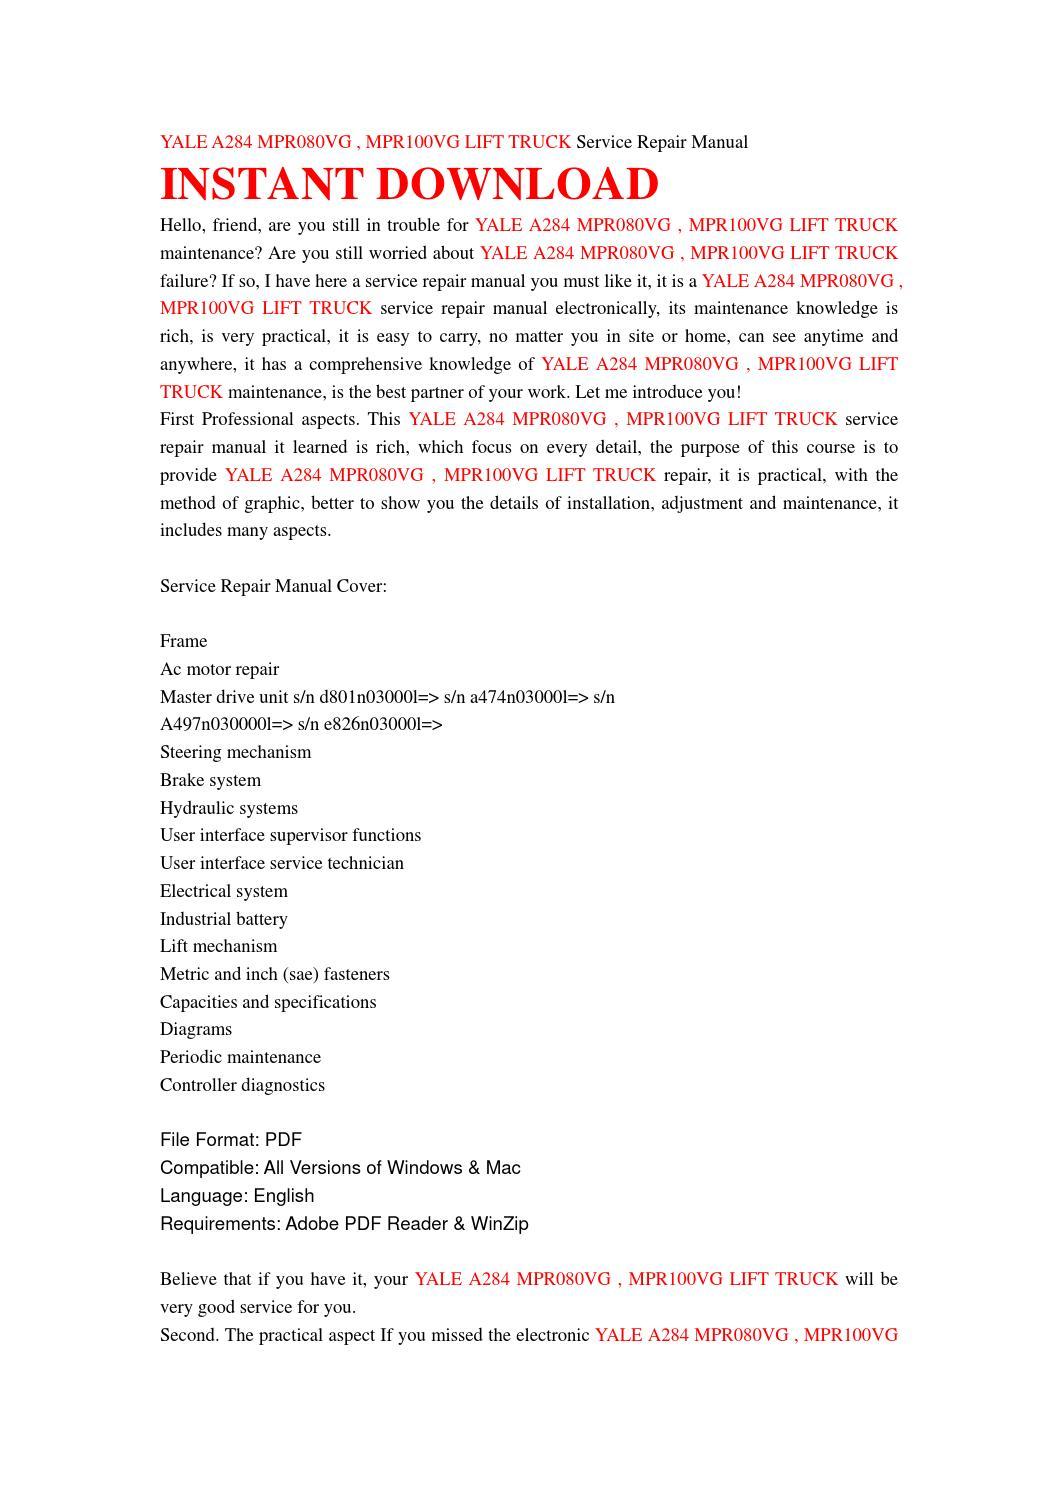 Yale A284 Mpr080vg Mpr100vg Lift Truck Service Repair Manual By Wiring Diagram Jhsnefjnse Issuu